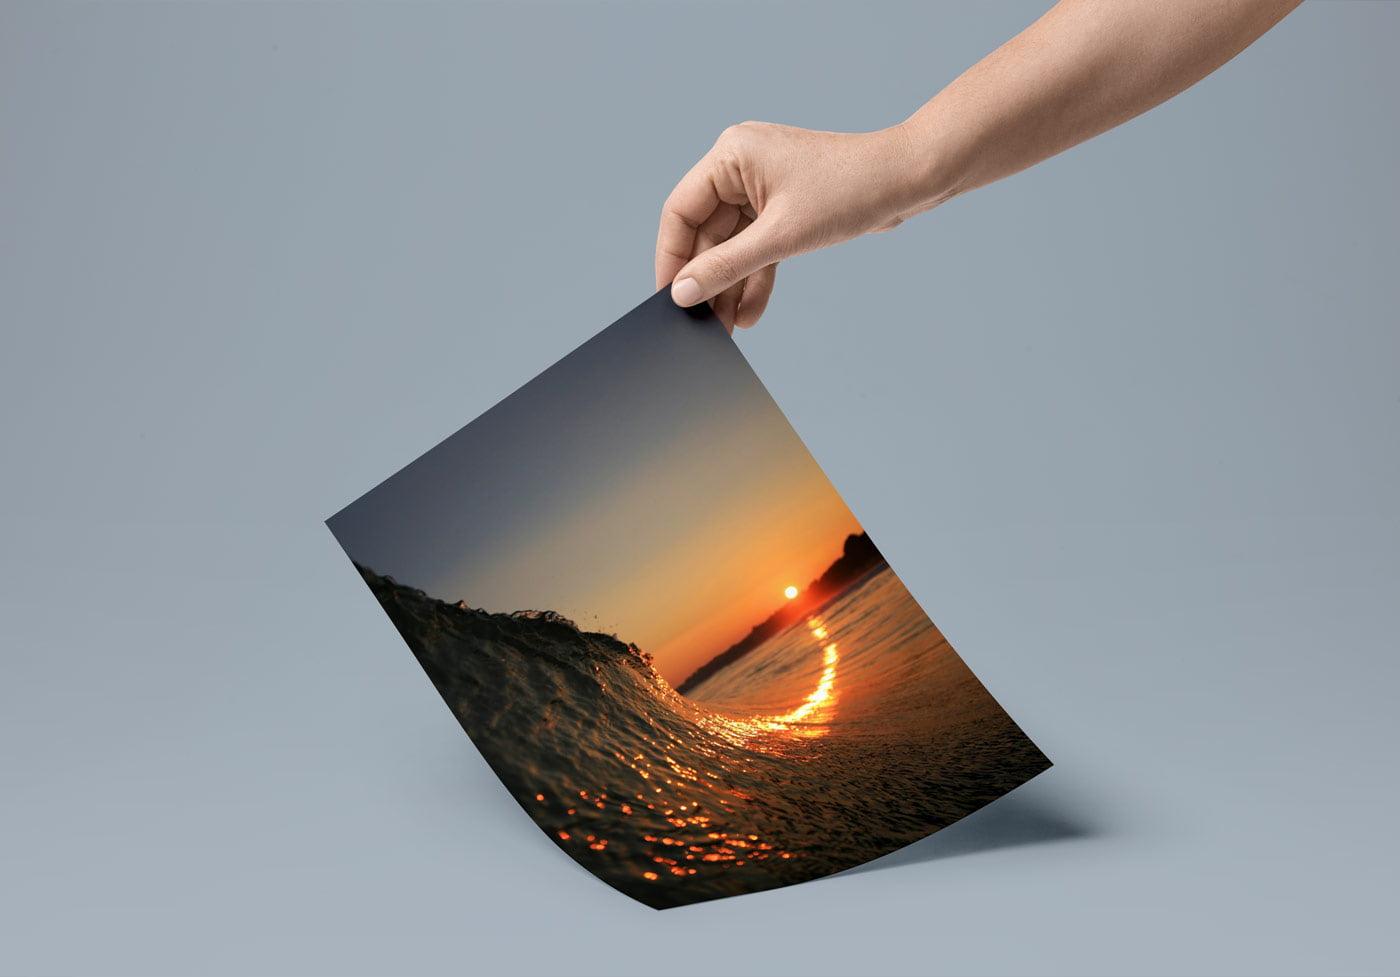 sunse photography 4 - آموزش عکاسی از غروب آفتاب